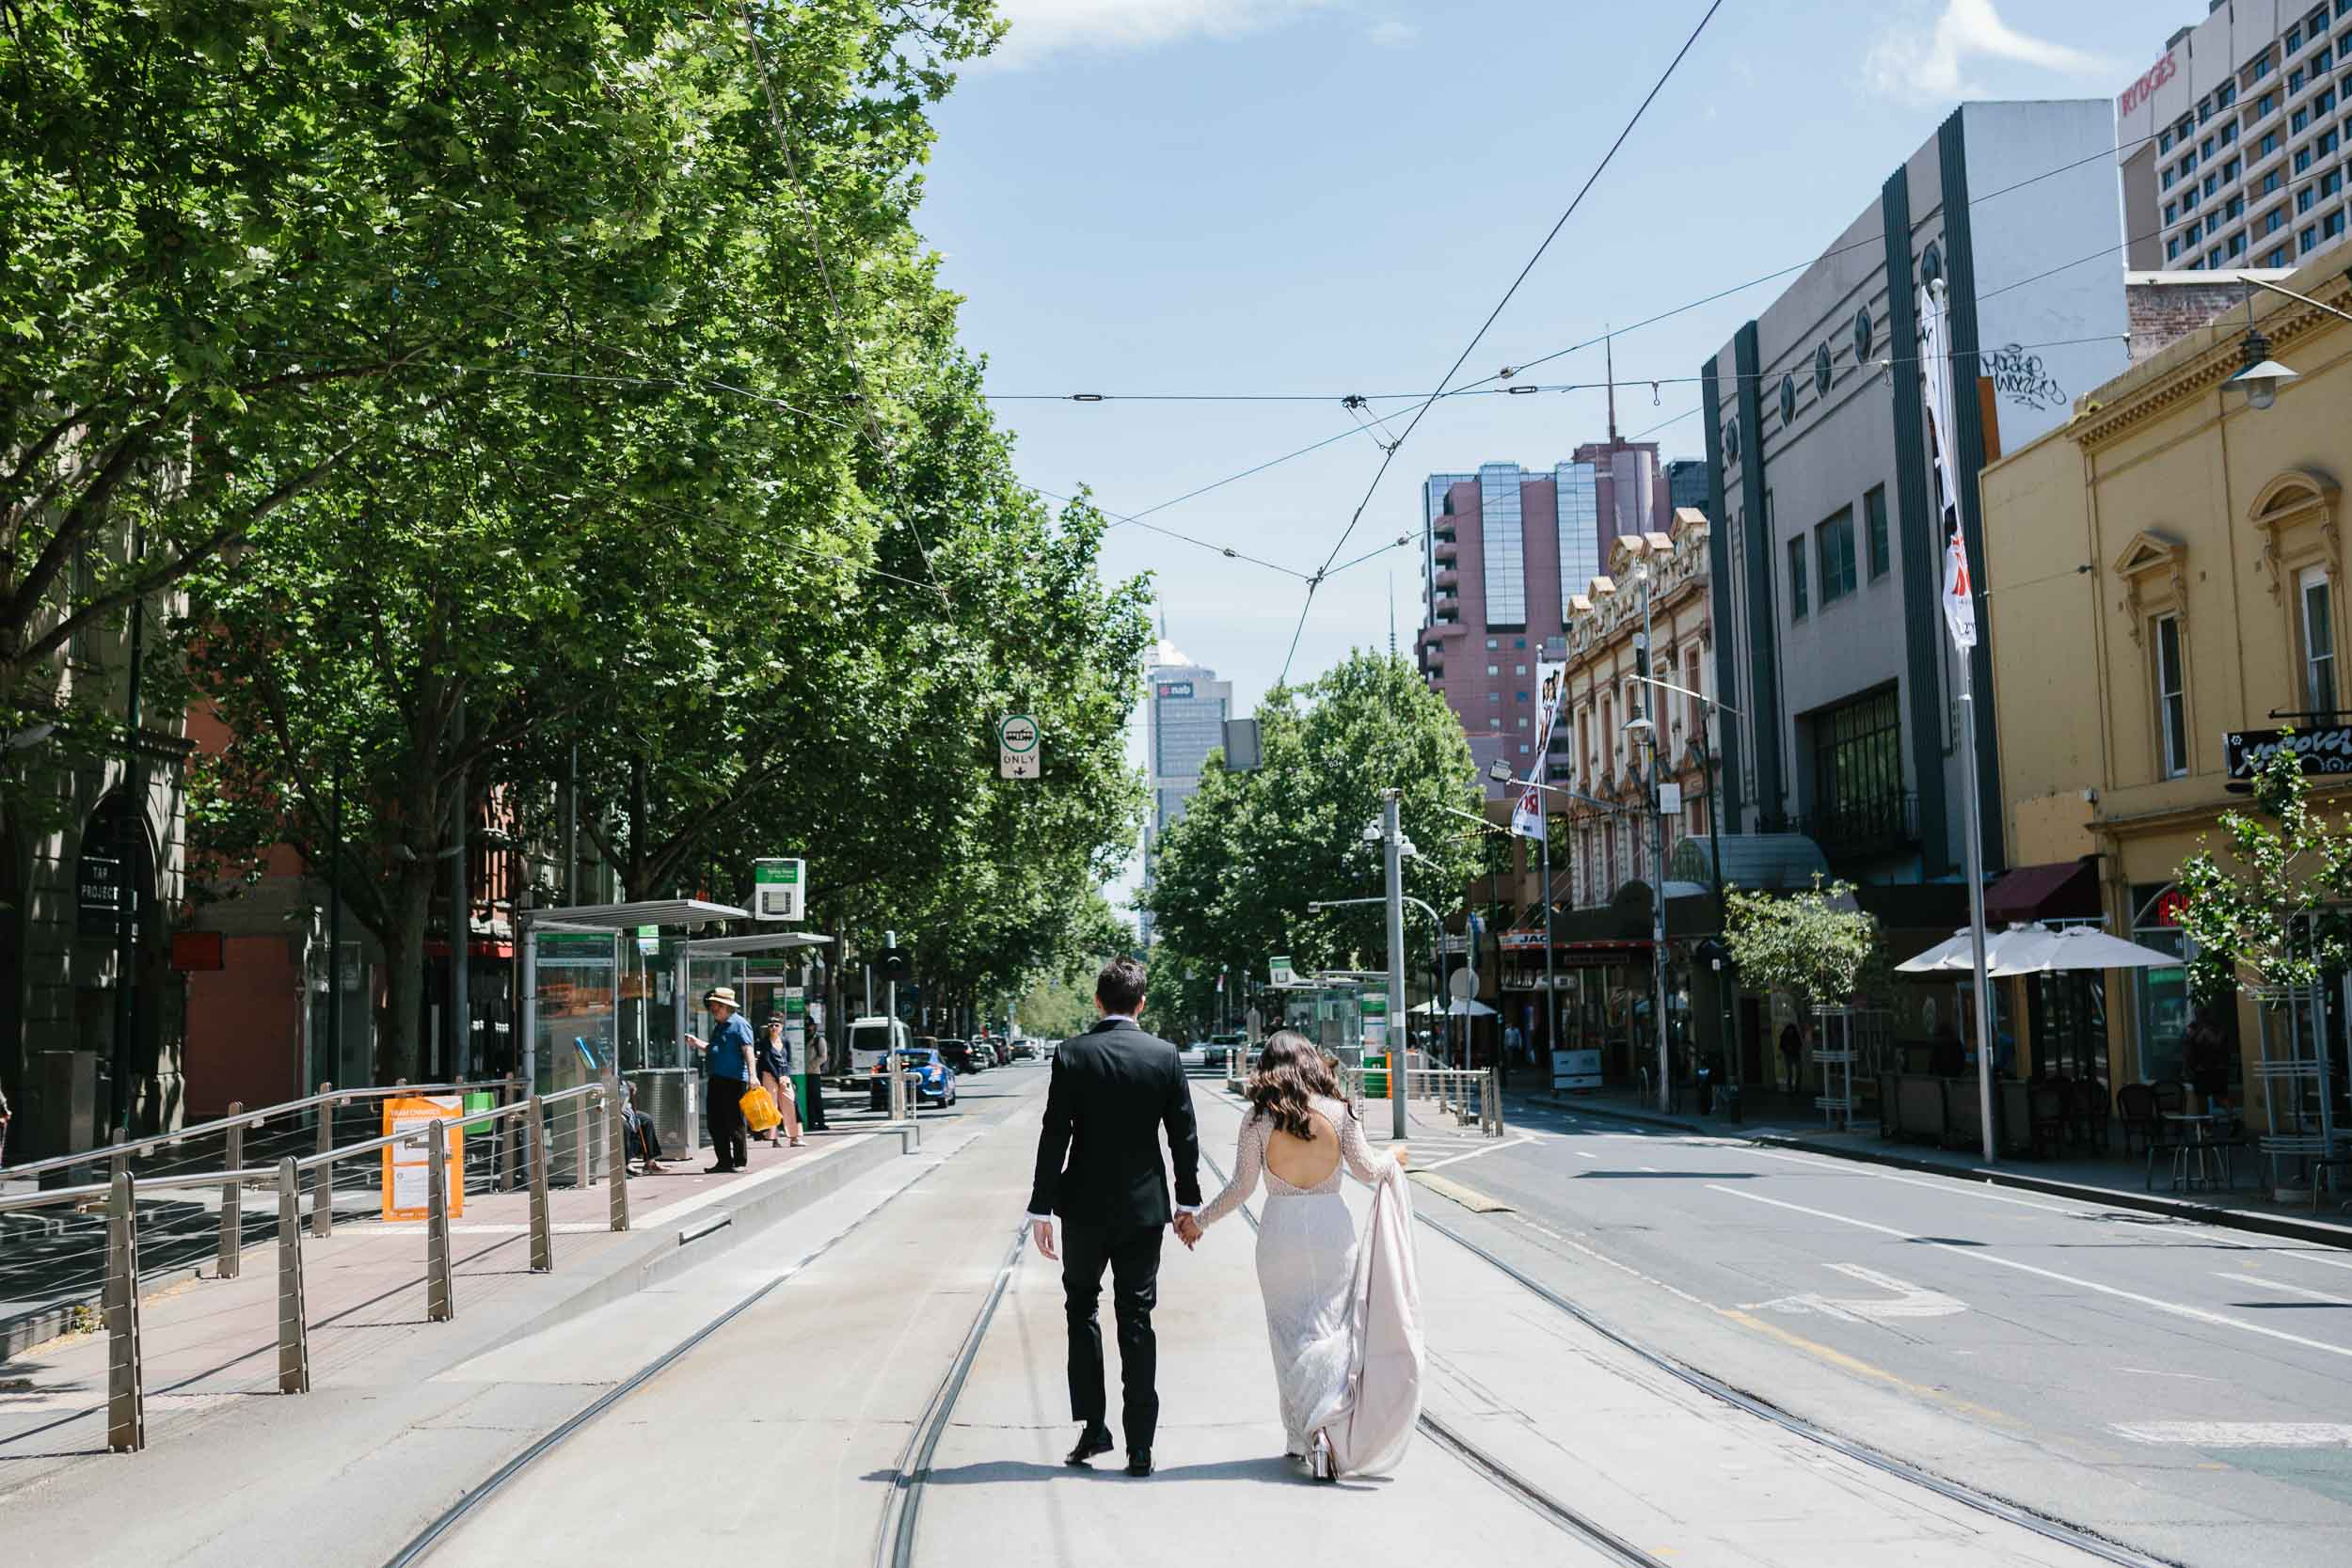 Kas-Richards-Wedding-Photographer-Melbourne-City-Wedding-Alto-Event-Space-Jane-Hill-Bridal-Gown-12.jpg